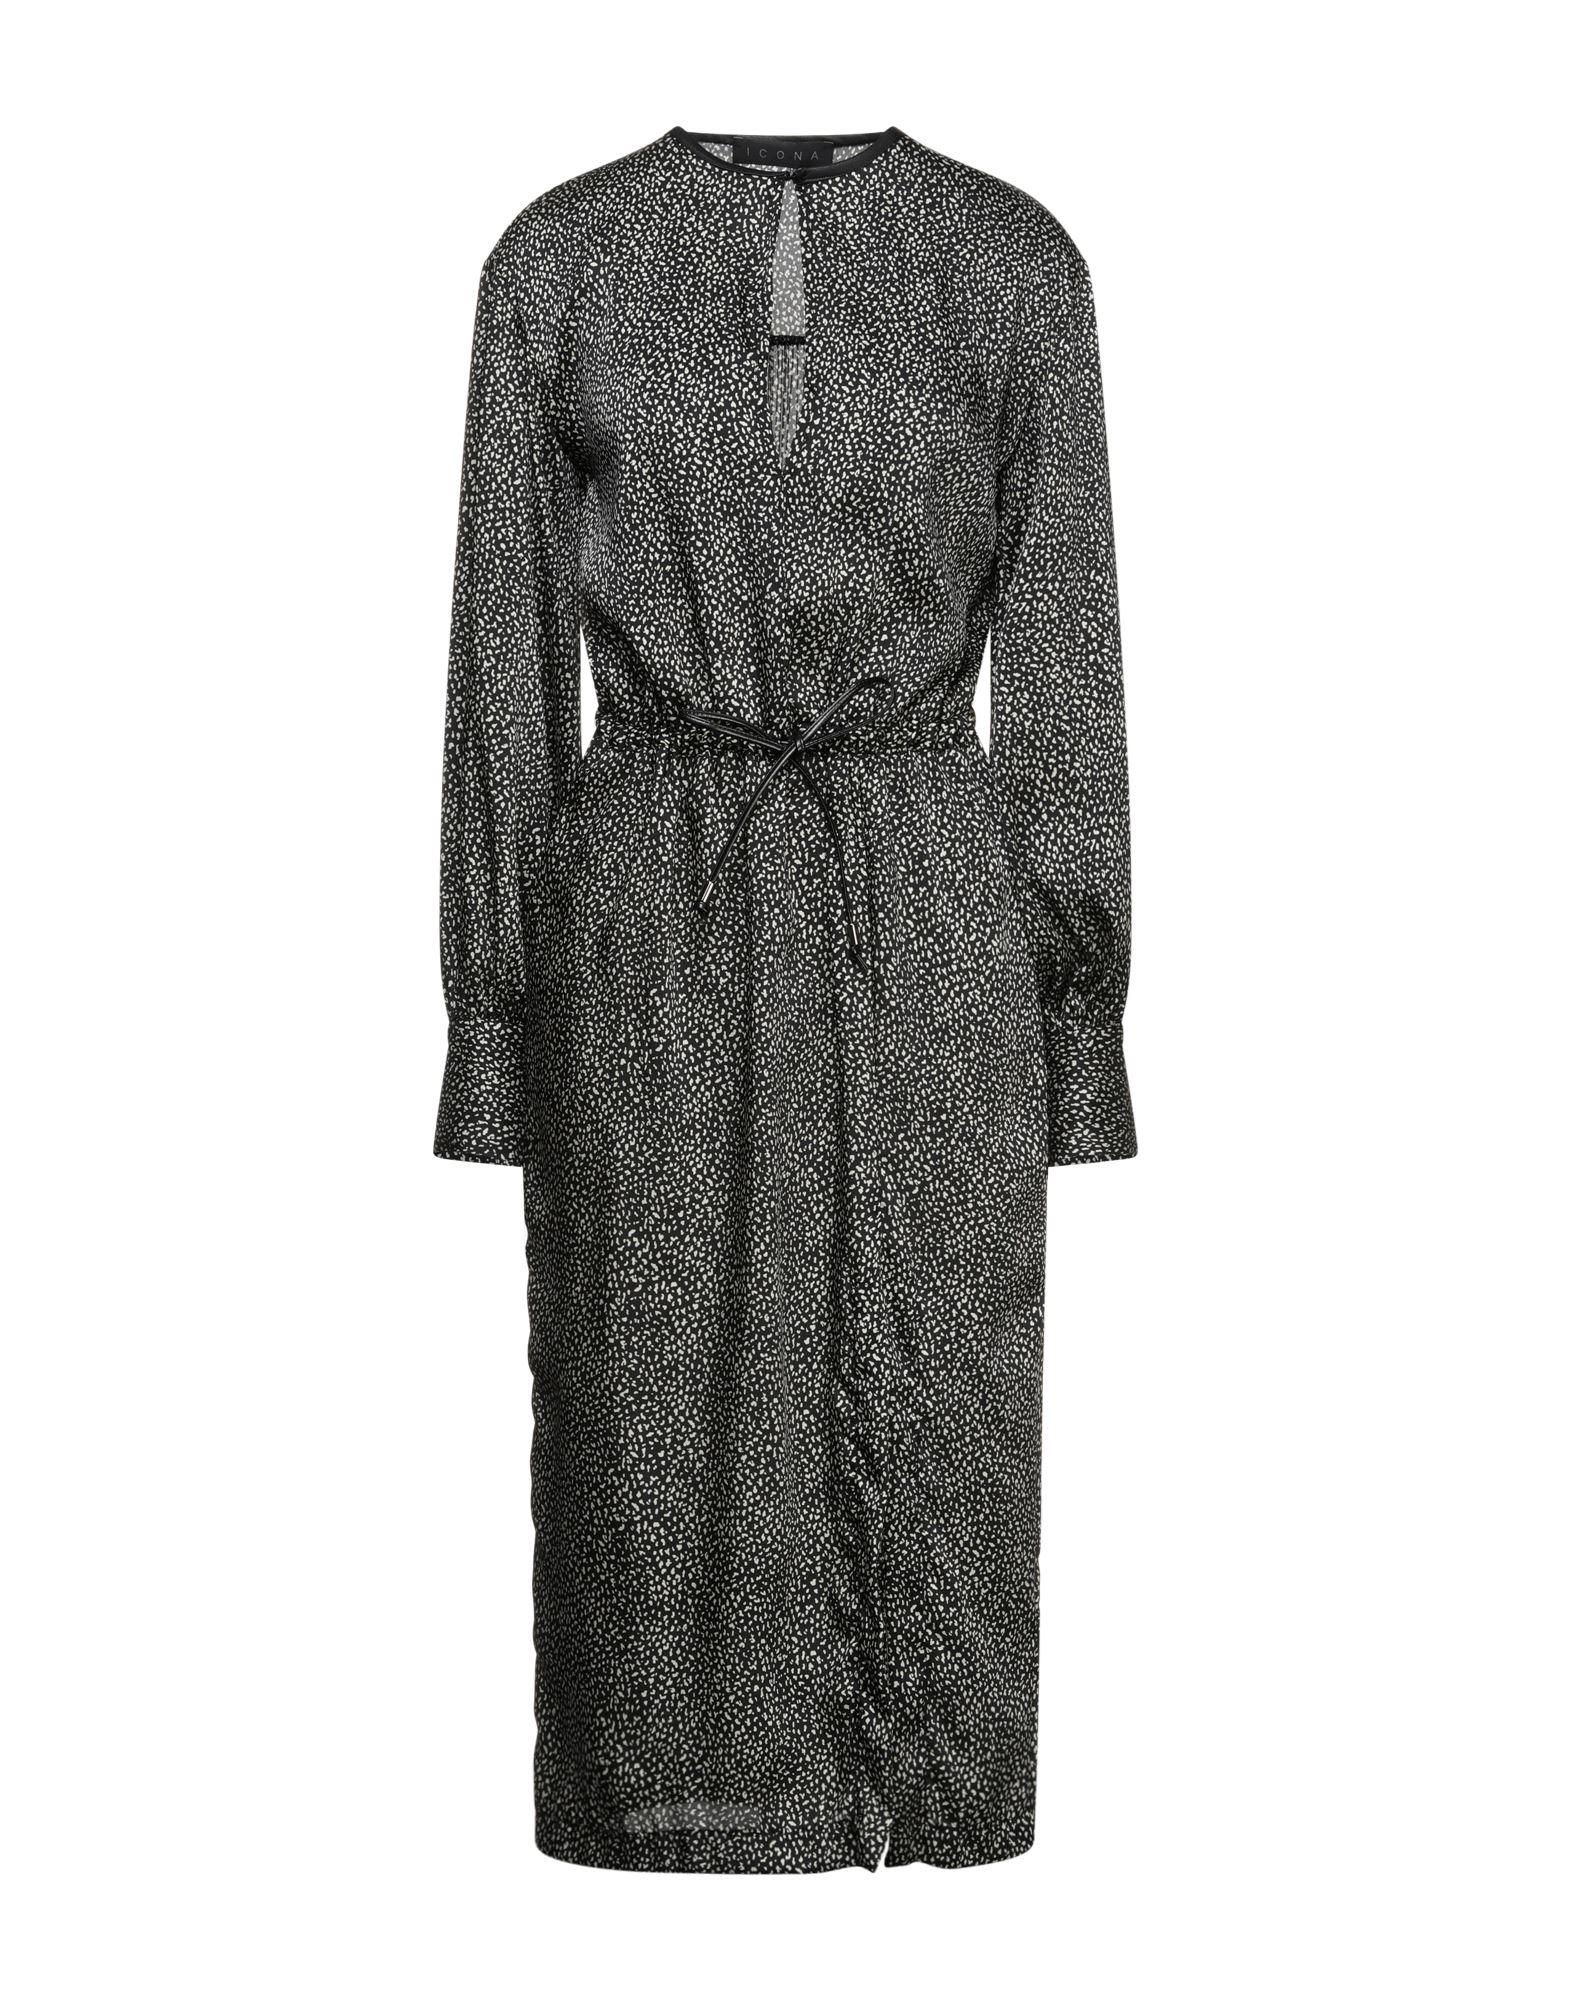 ICONA by KAOS Платье длиной 3/4 icona by kaos длинное платье